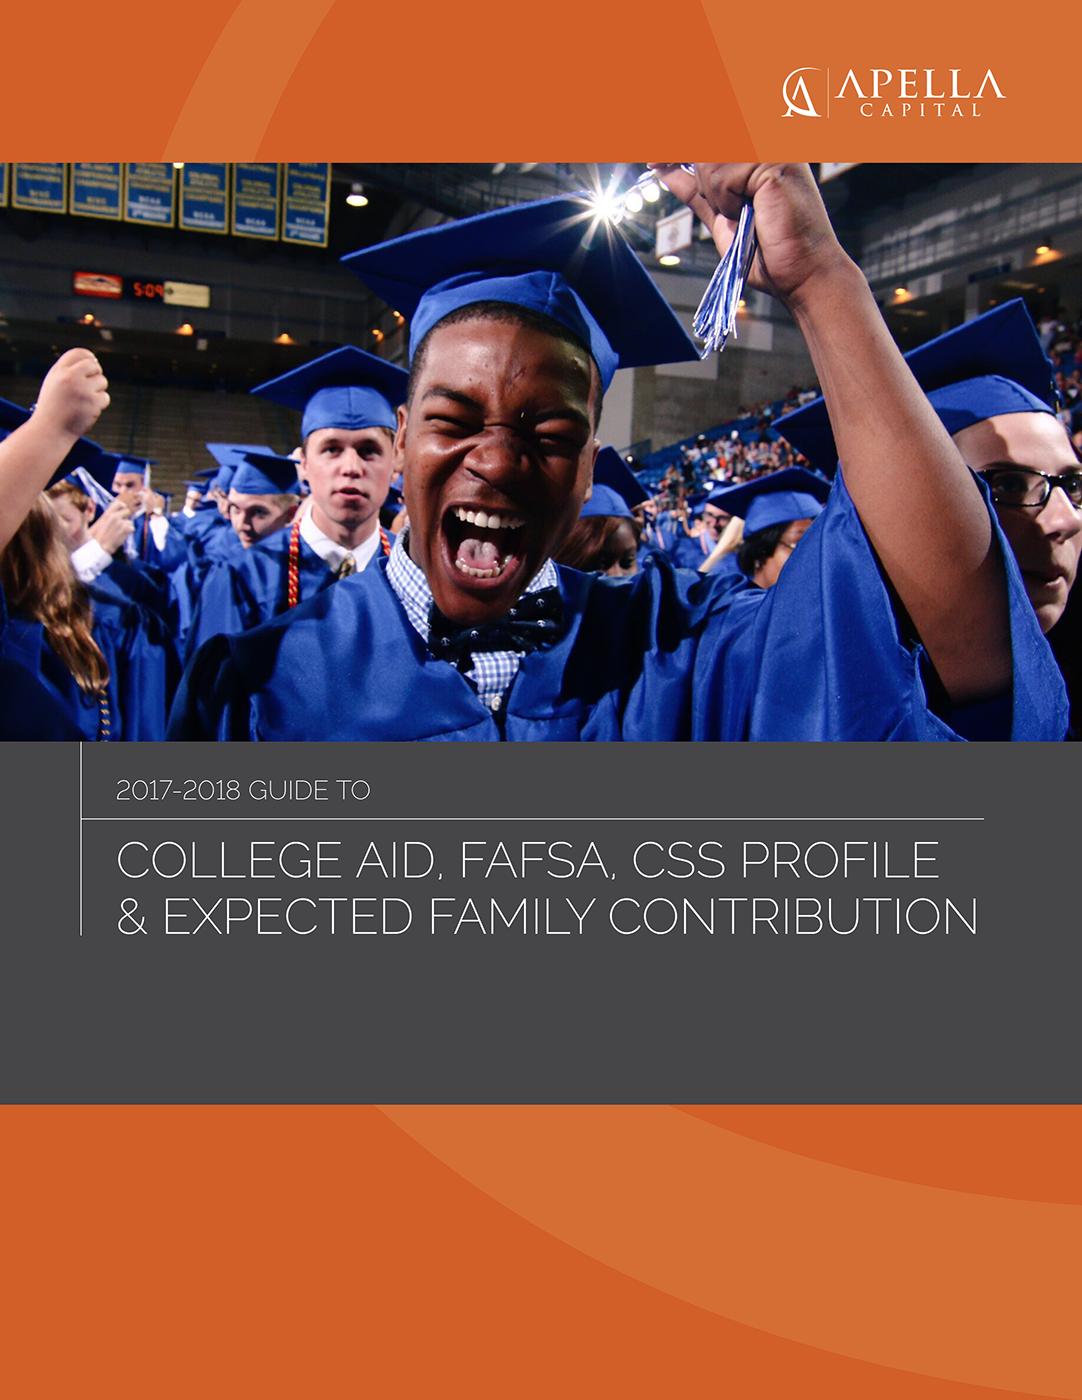 2017 Apella_Financial Aid guide-COVER mockup_WEB.png